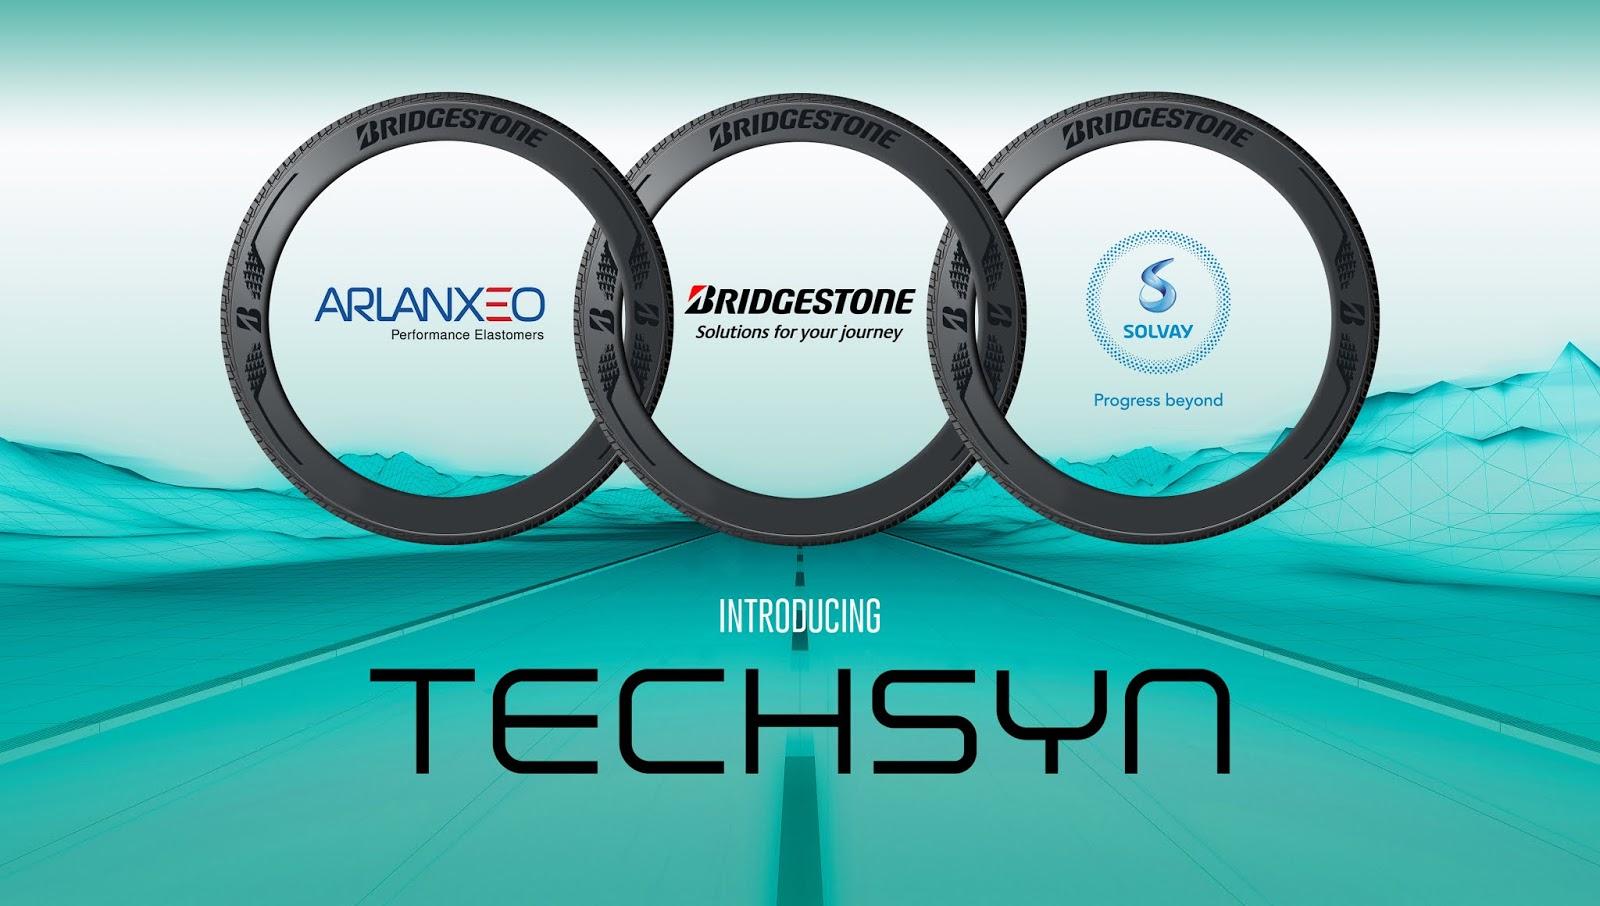 TECHSYN2Blaunch2Bimage Τι νέο φέρνει η τεχνολογία TECHSYN των Bridgestone, ARLANXEO και Solvay Arlanxeo, Bridgestone, Solvay, ειδήσεις, Ελαστικά